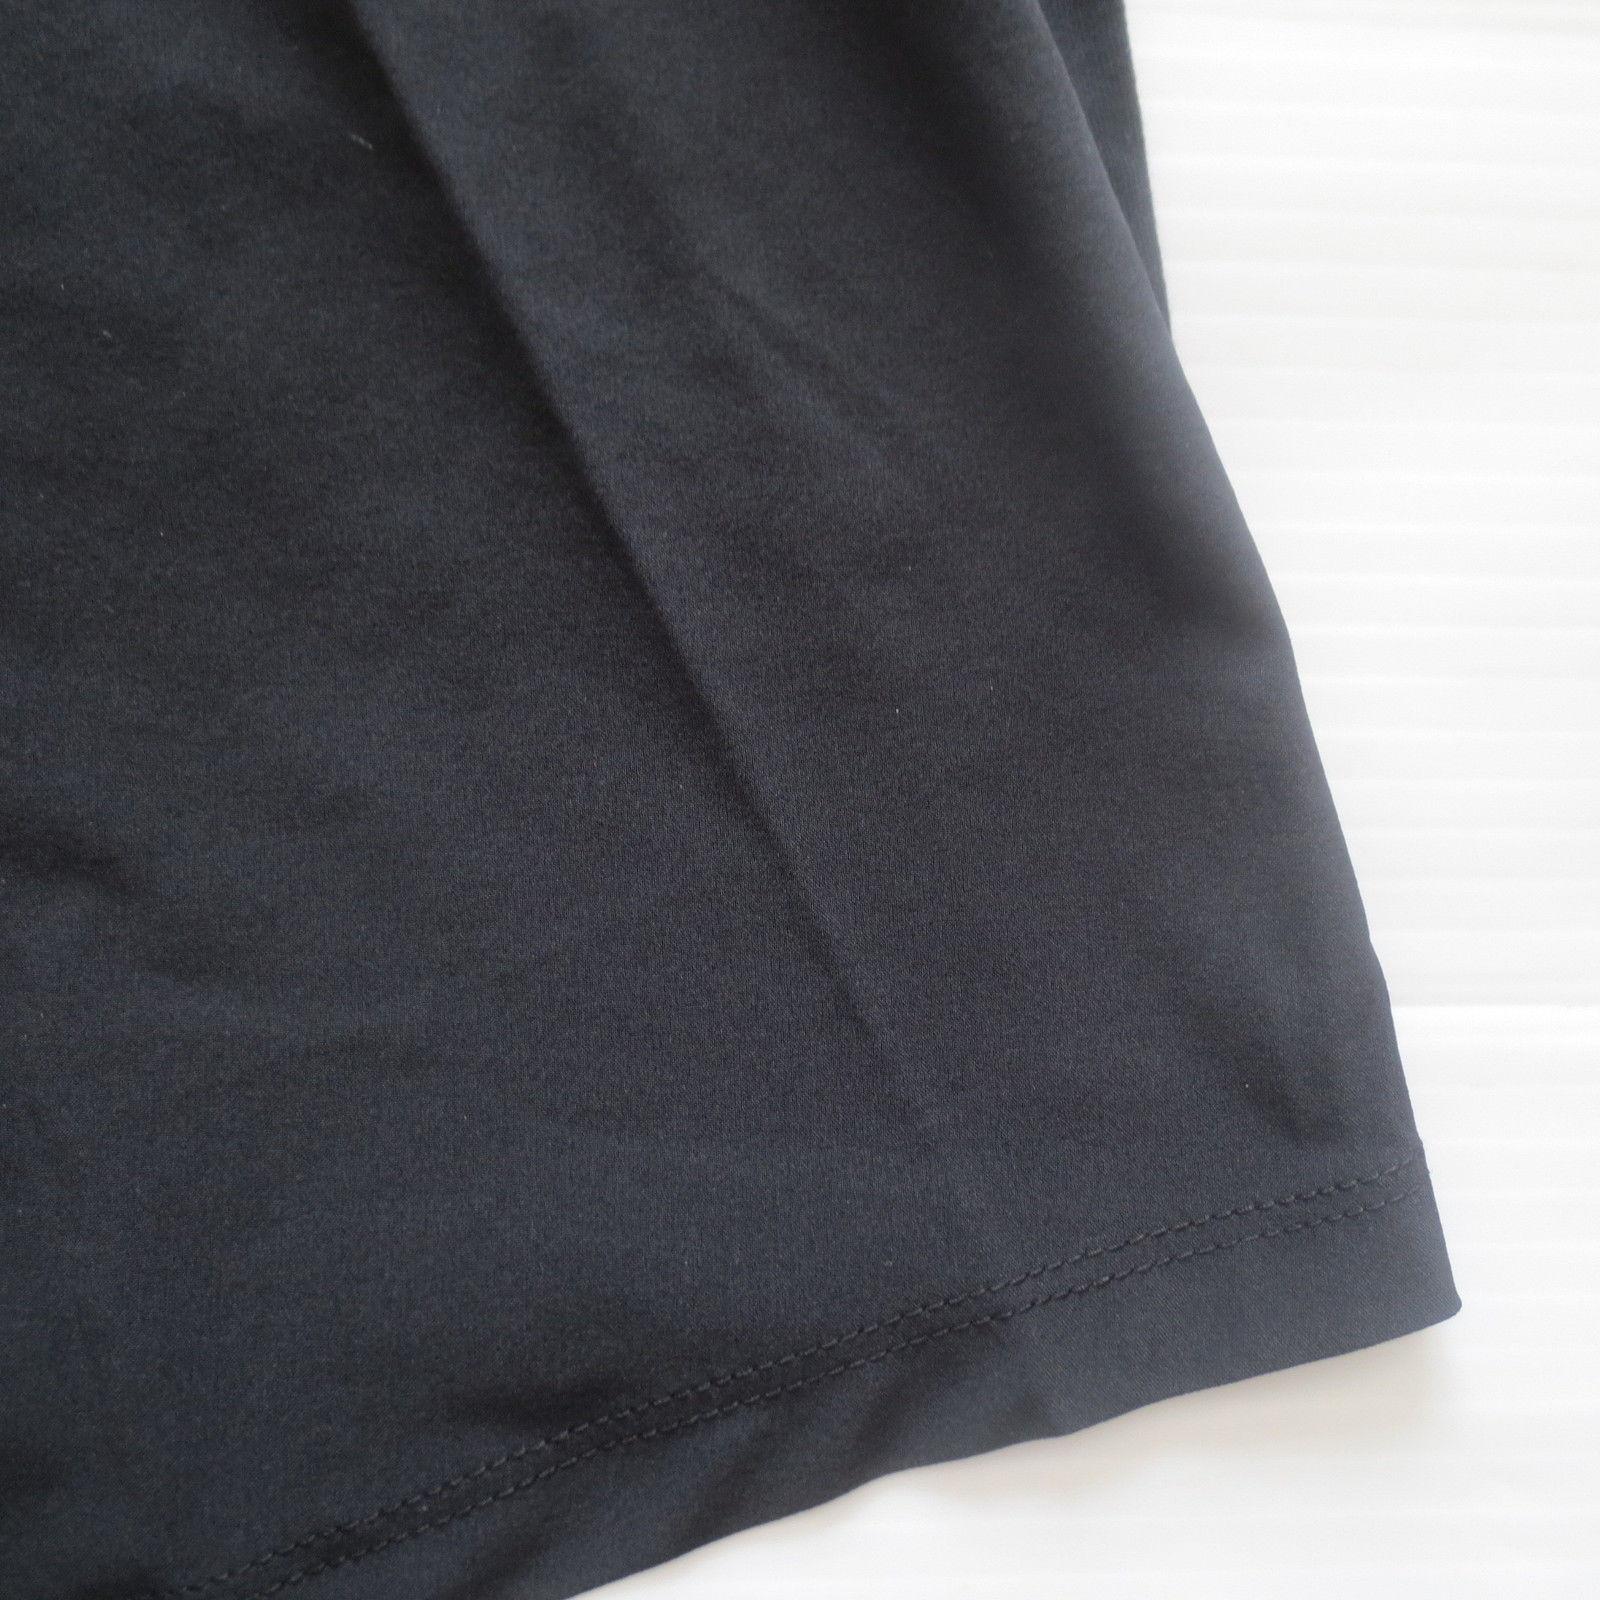 Nike Women Breathe Tank Top Shirt - 862774 - Black 010 - Size L - NWT image 9